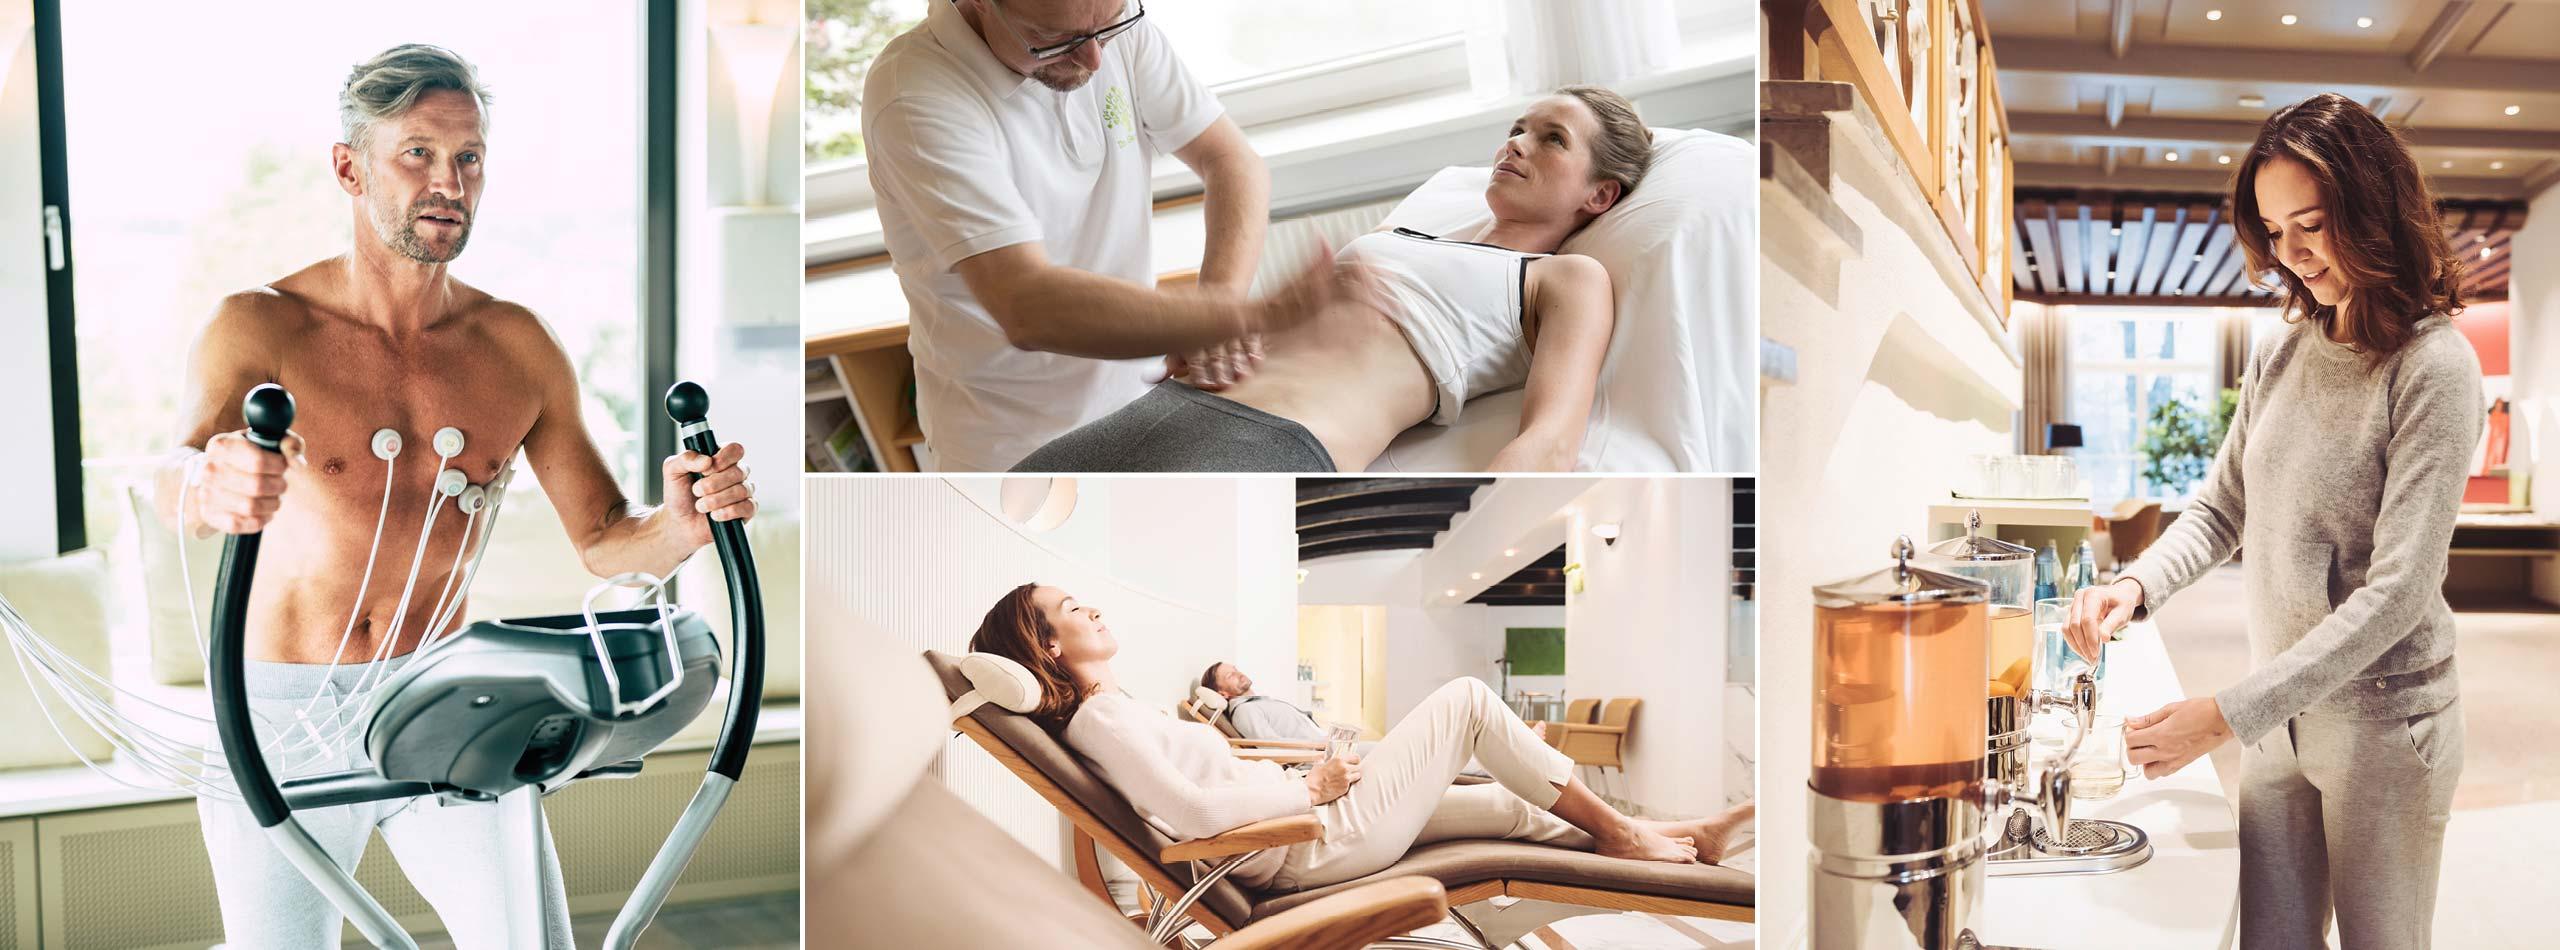 Health Blog | Park Igls Mayr Health Retreat and Medical Spa